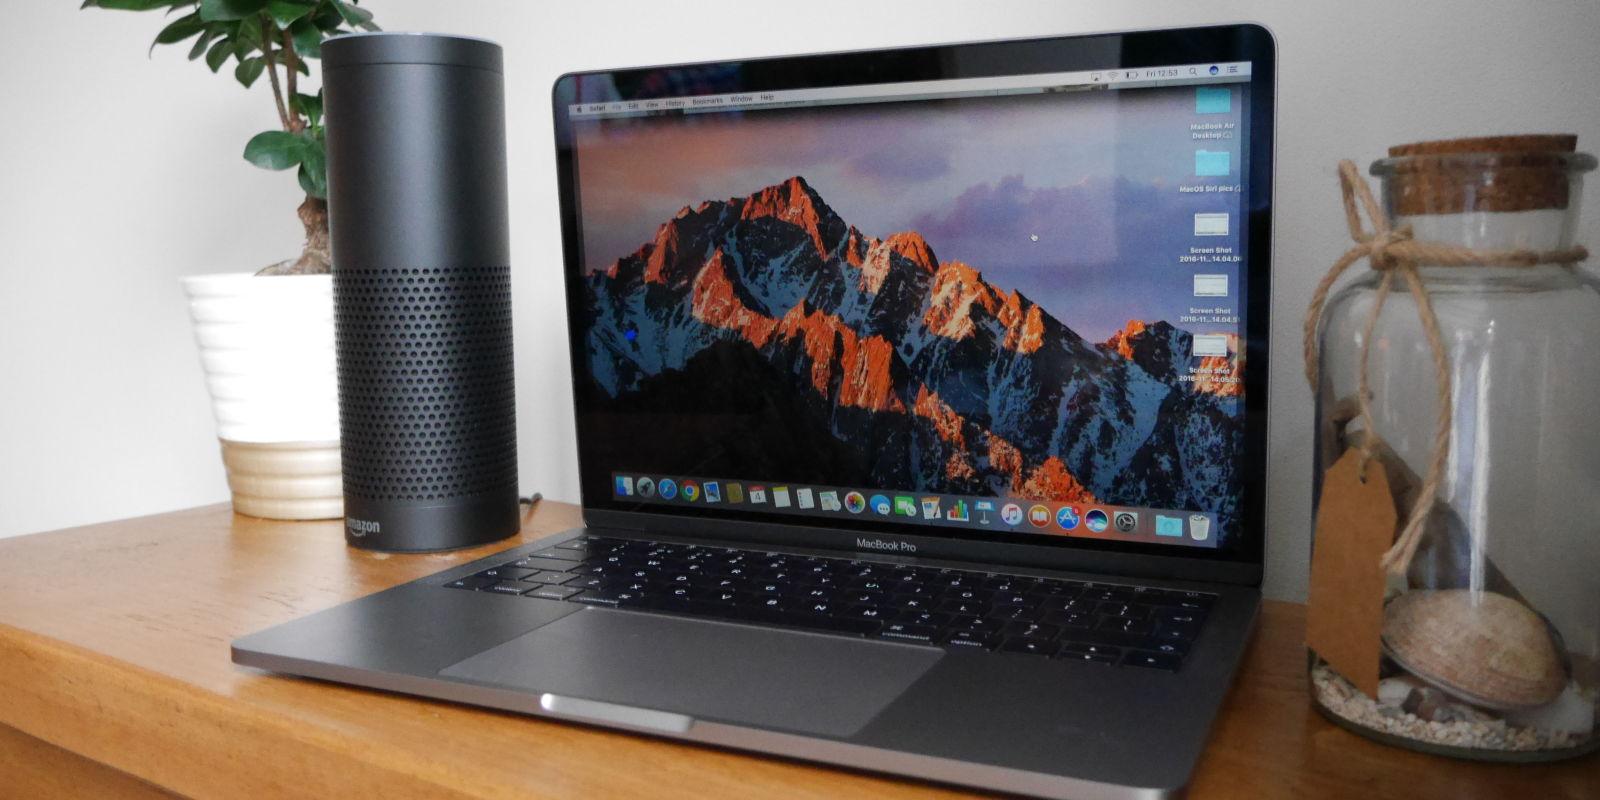 probleme macbook pro 2016